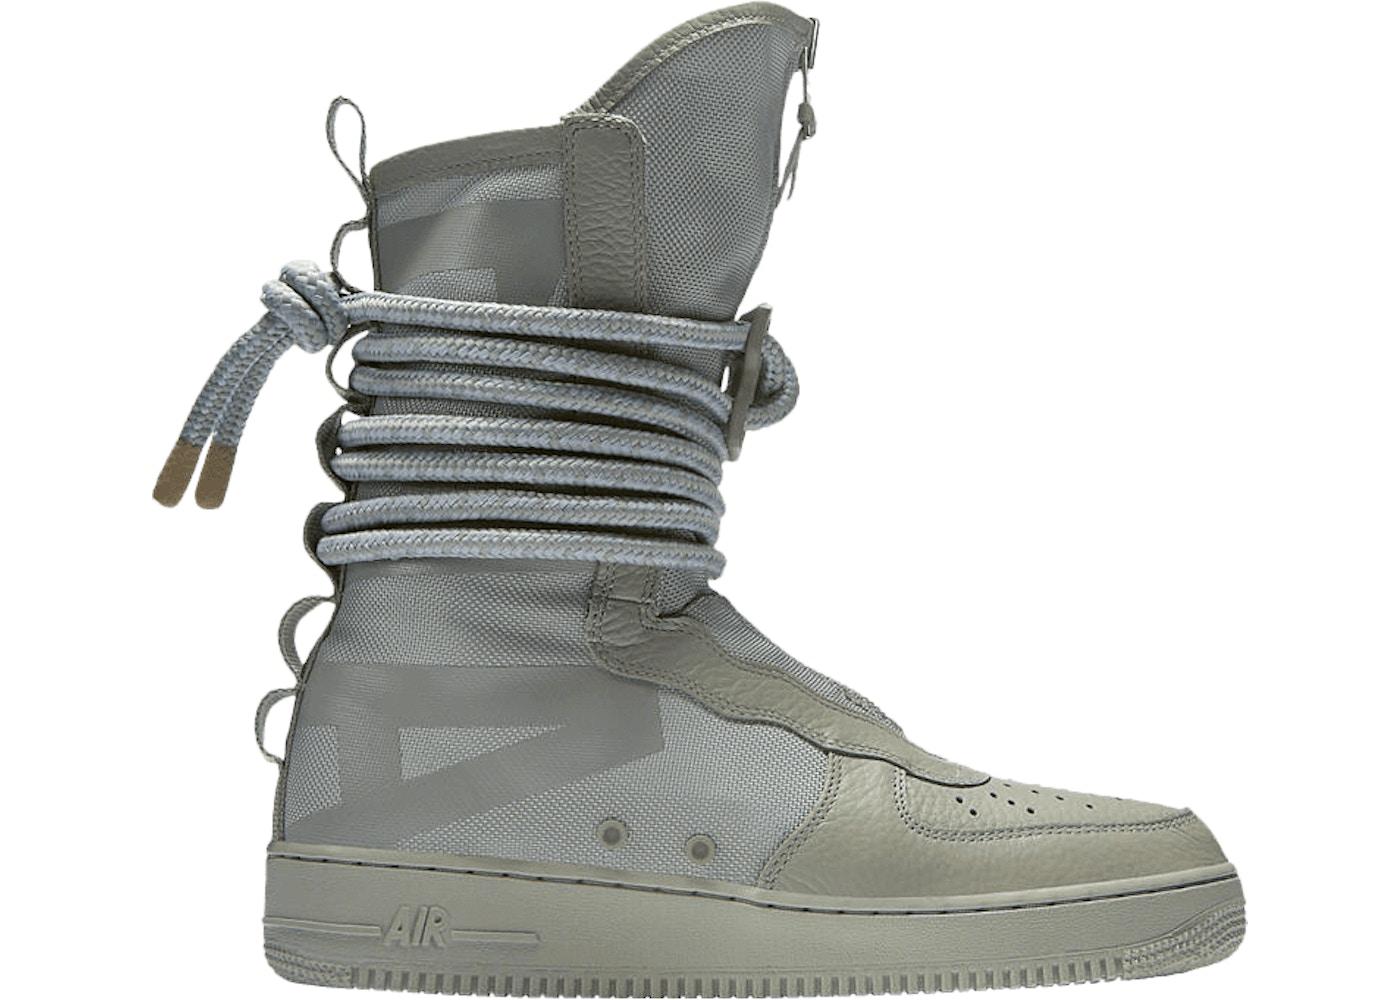 nike air force 1 sf high